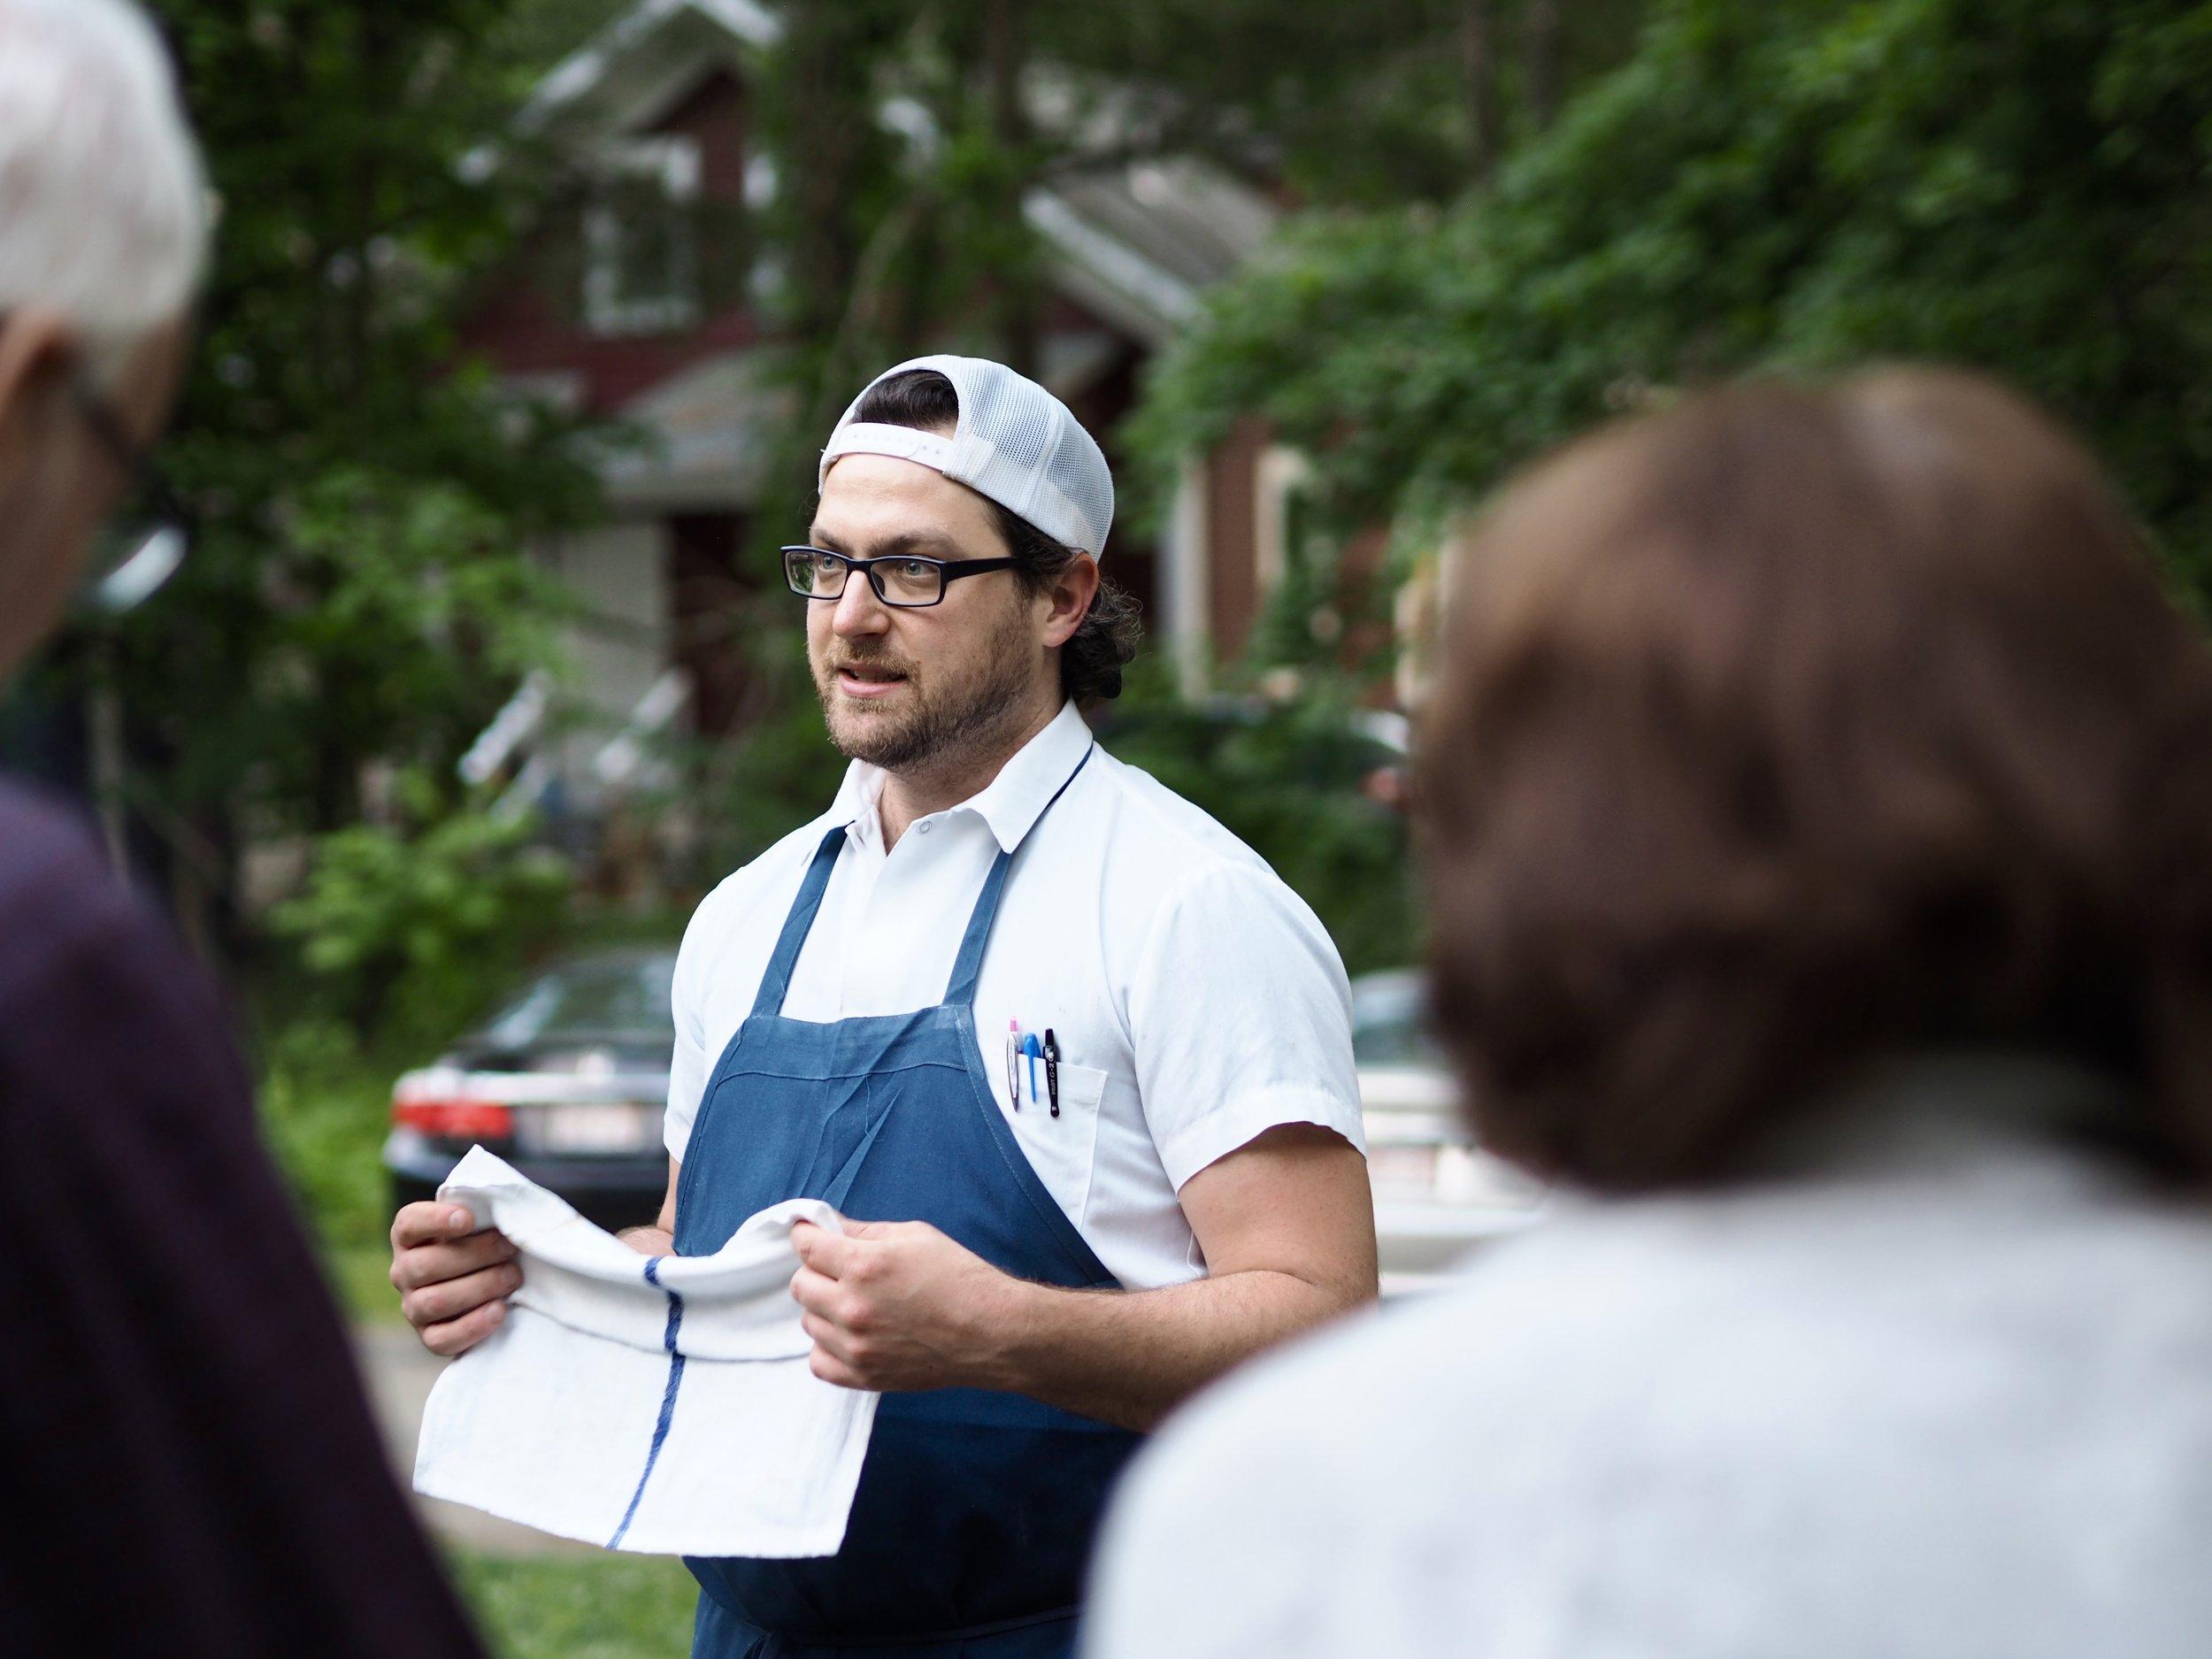 Chef Aaron Furmanek